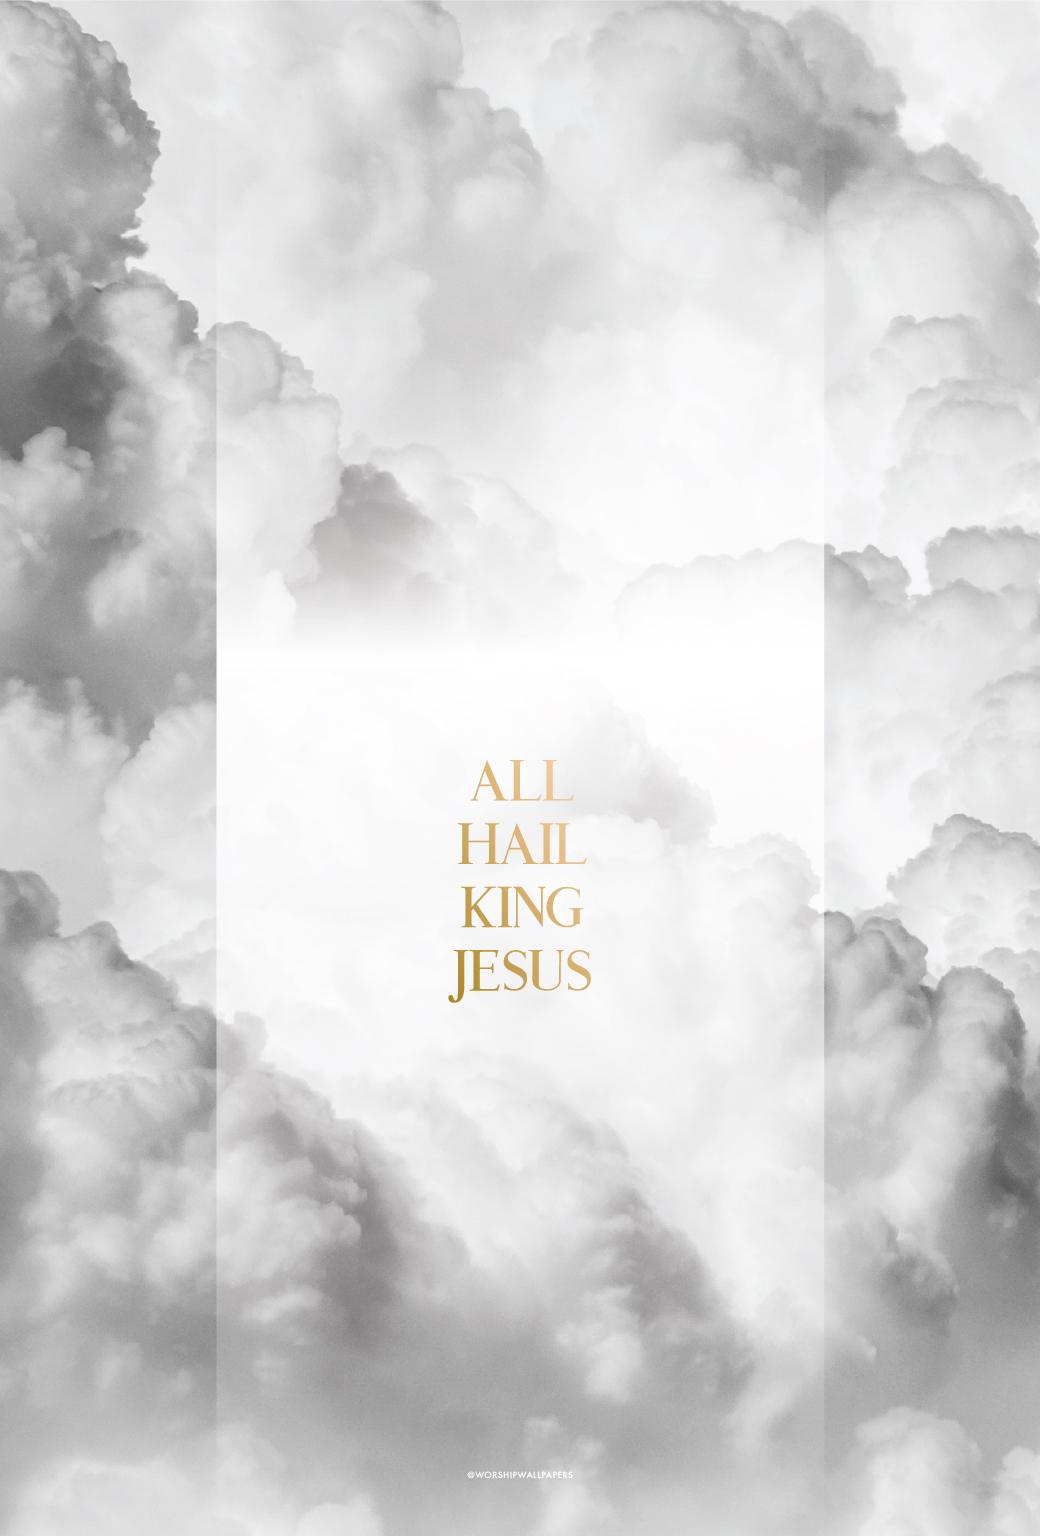 All hail king jesus upper room music worship wallpapers all hail king jesus phone voltagebd Gallery